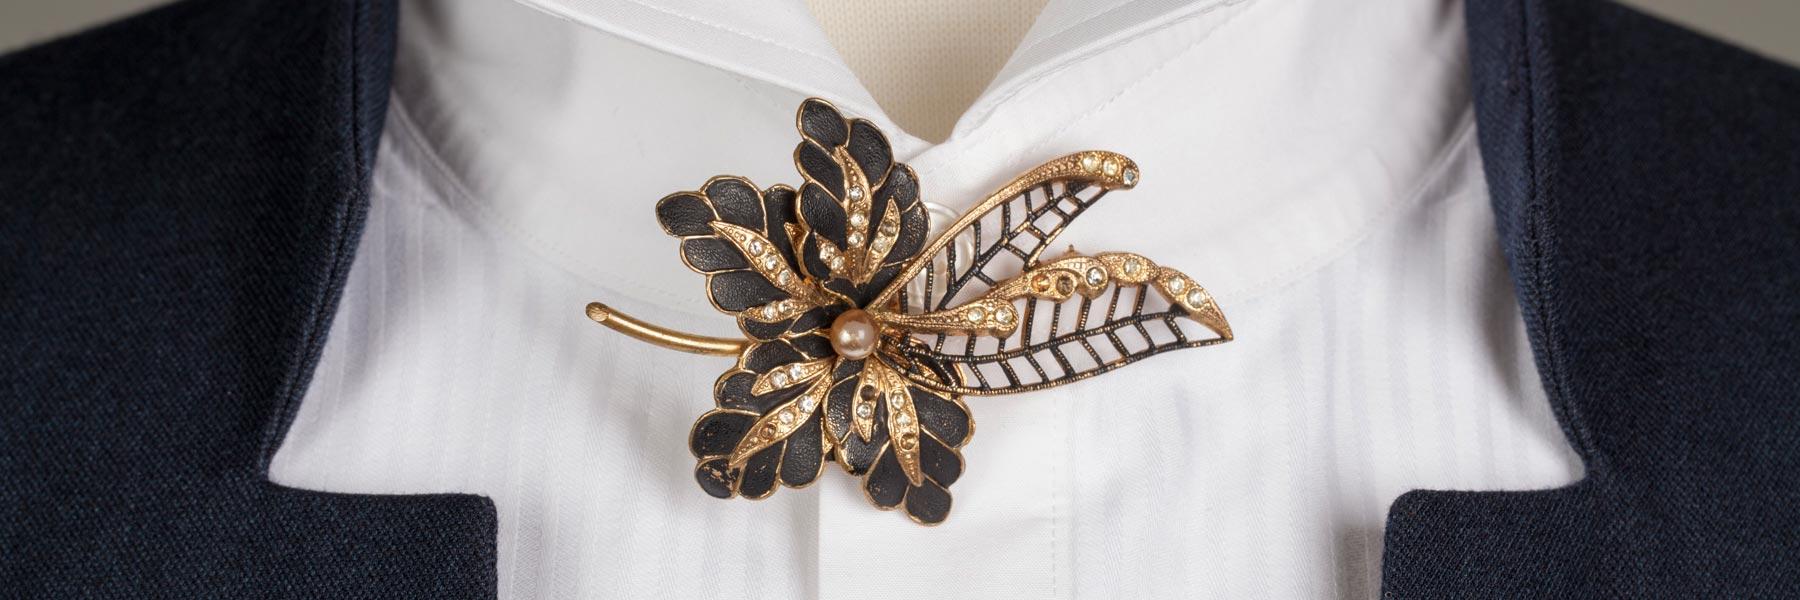 Bespoke Textiles brooch